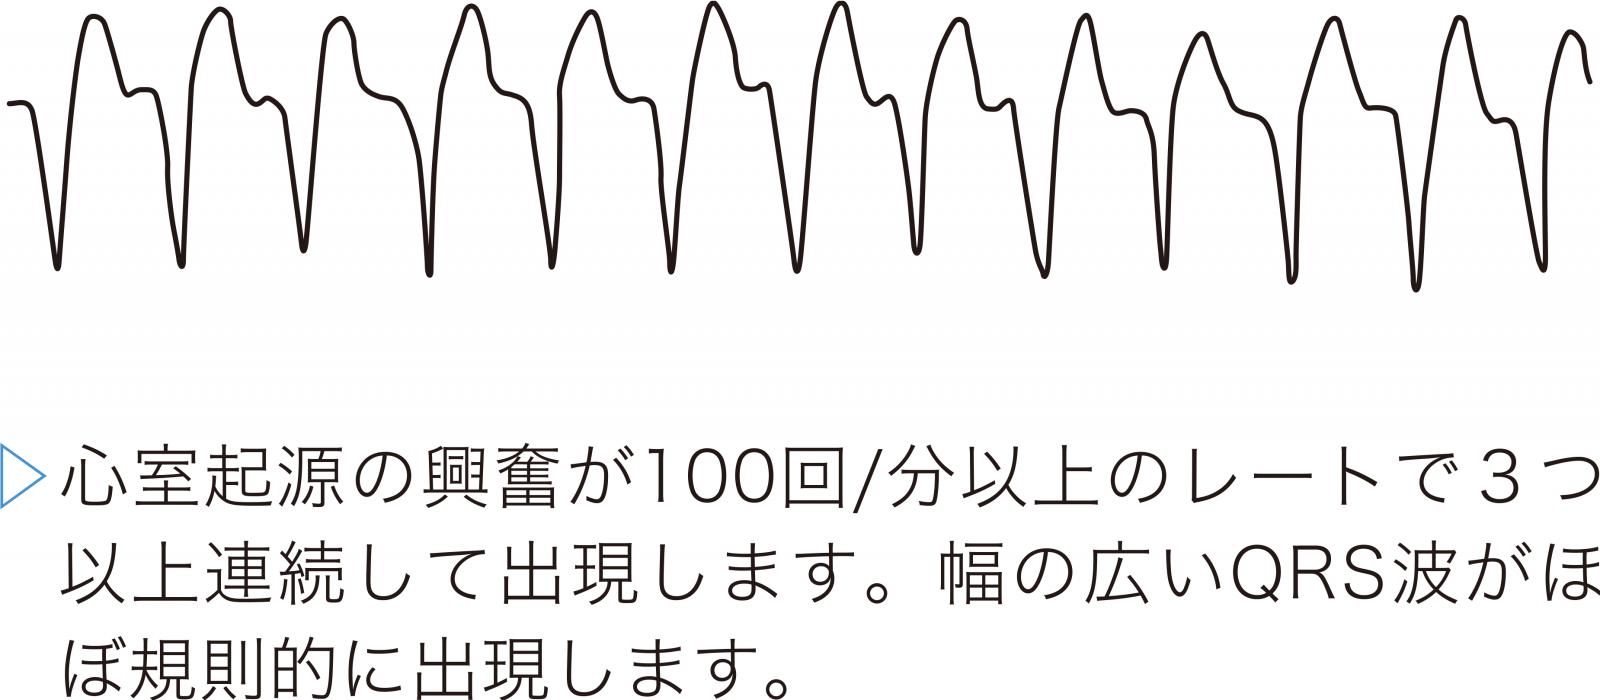 心室頻拍(VT)の心電図波形